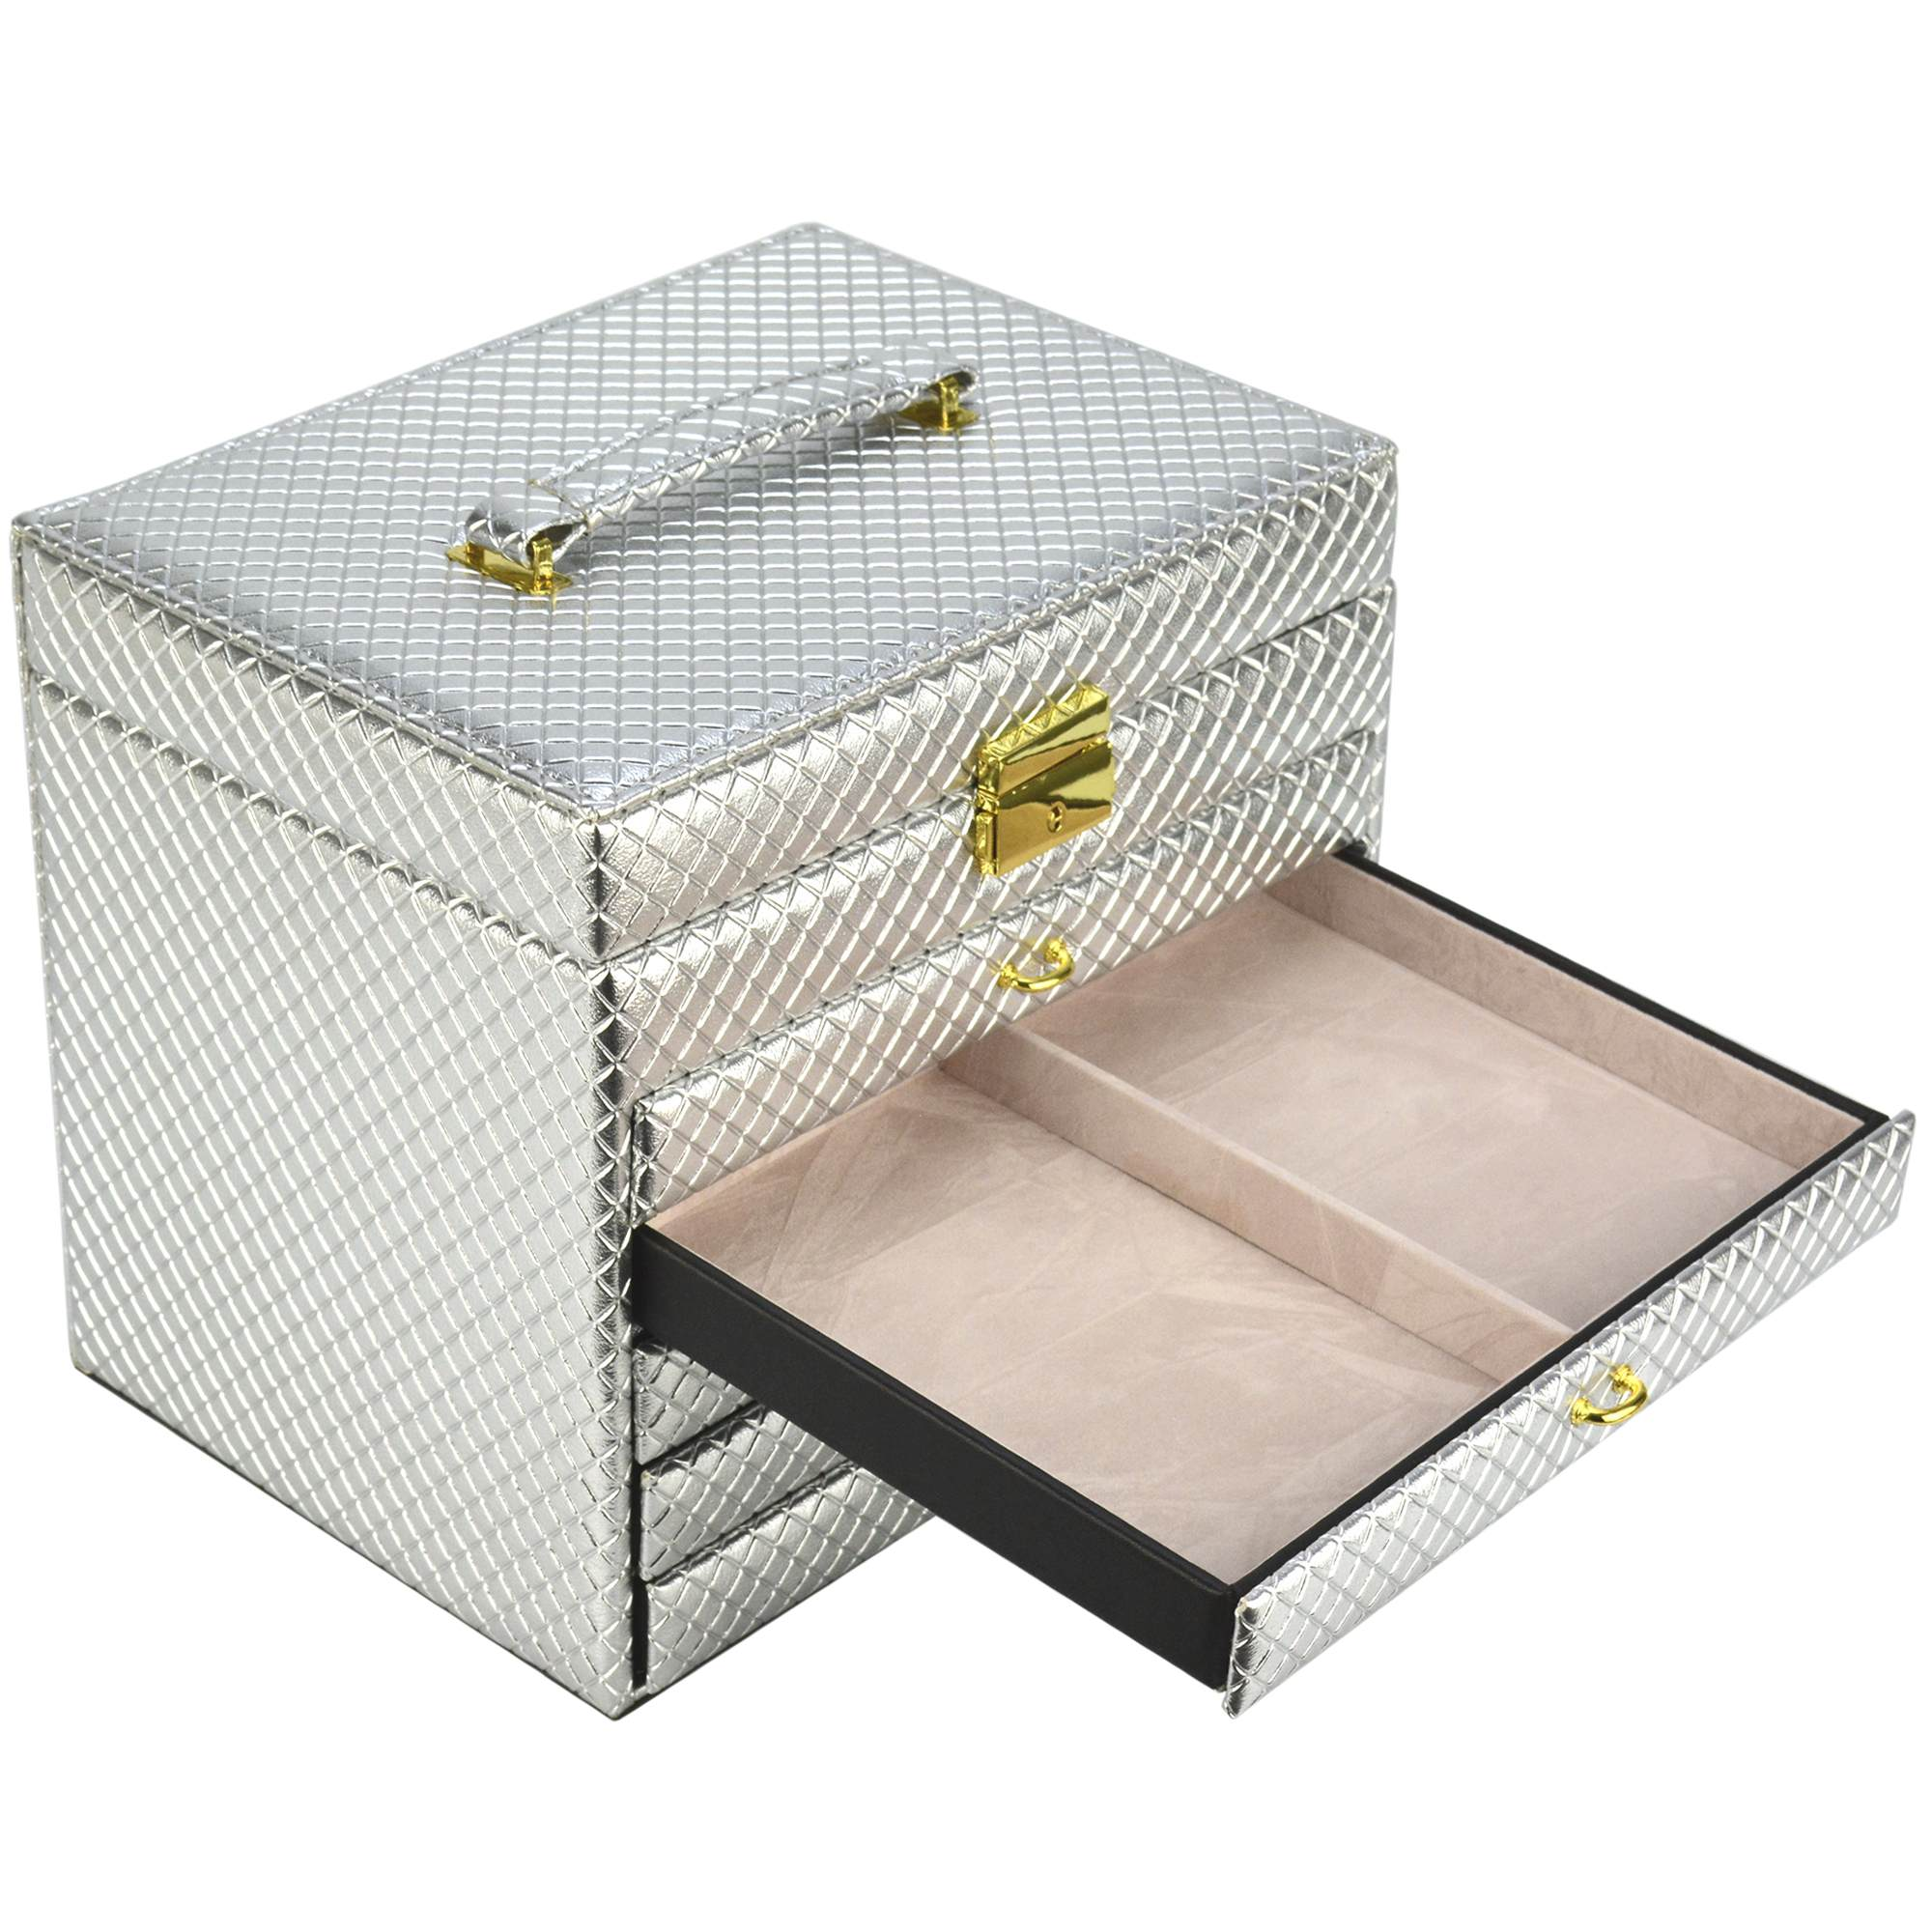 Caixa Para Joias Bijuteria 5 Gavetas Luxo Prata CBRN13067